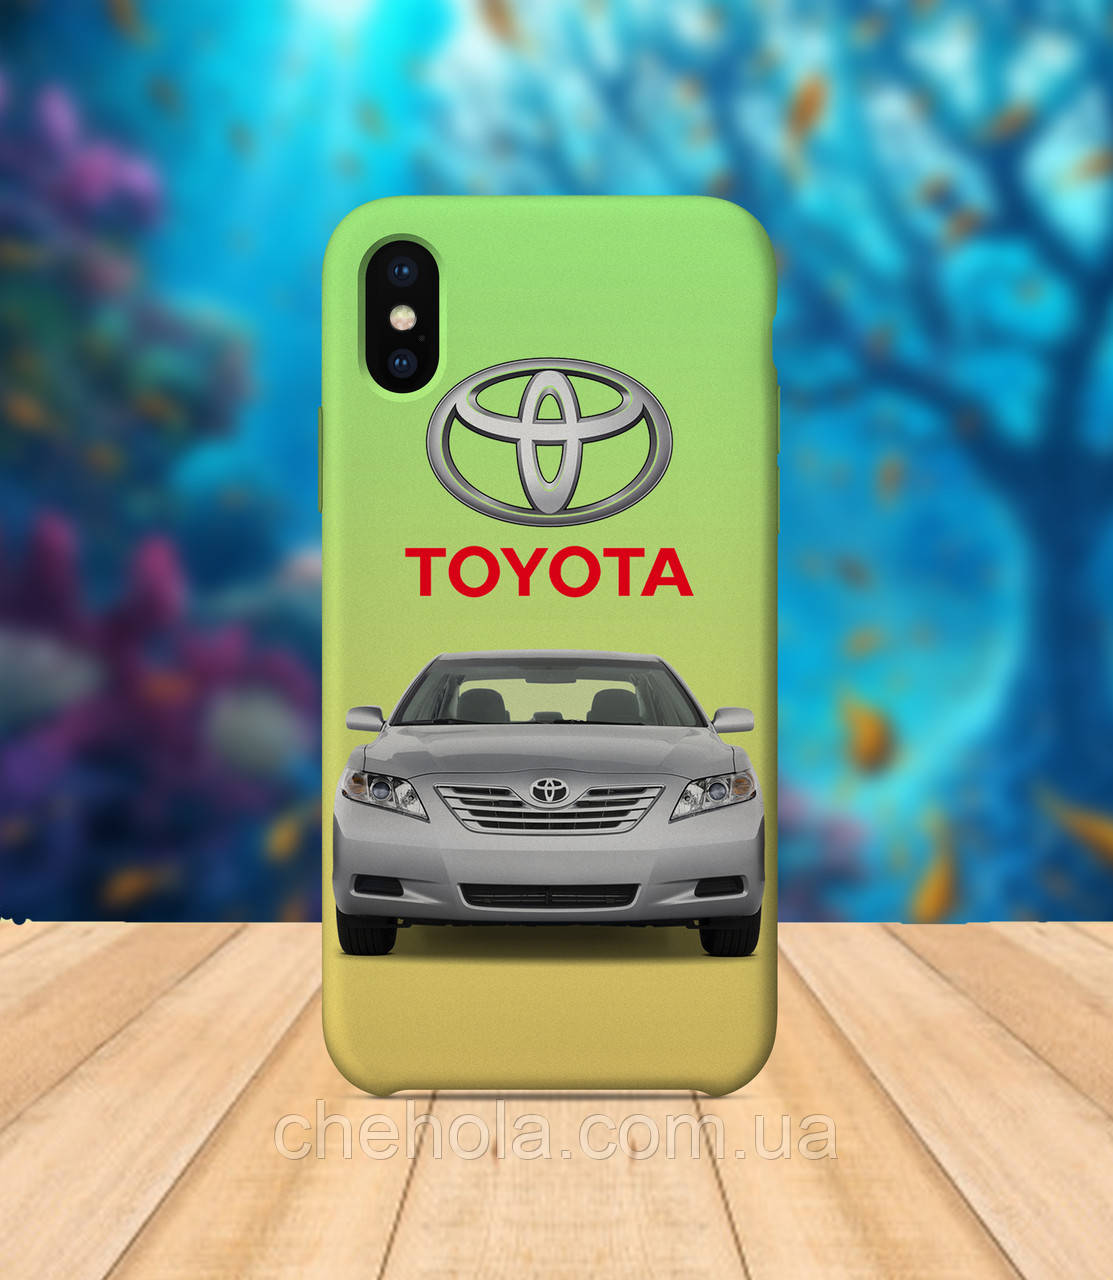 Чехол для apple iphone x XS max Toyota Camry чехол с принтом